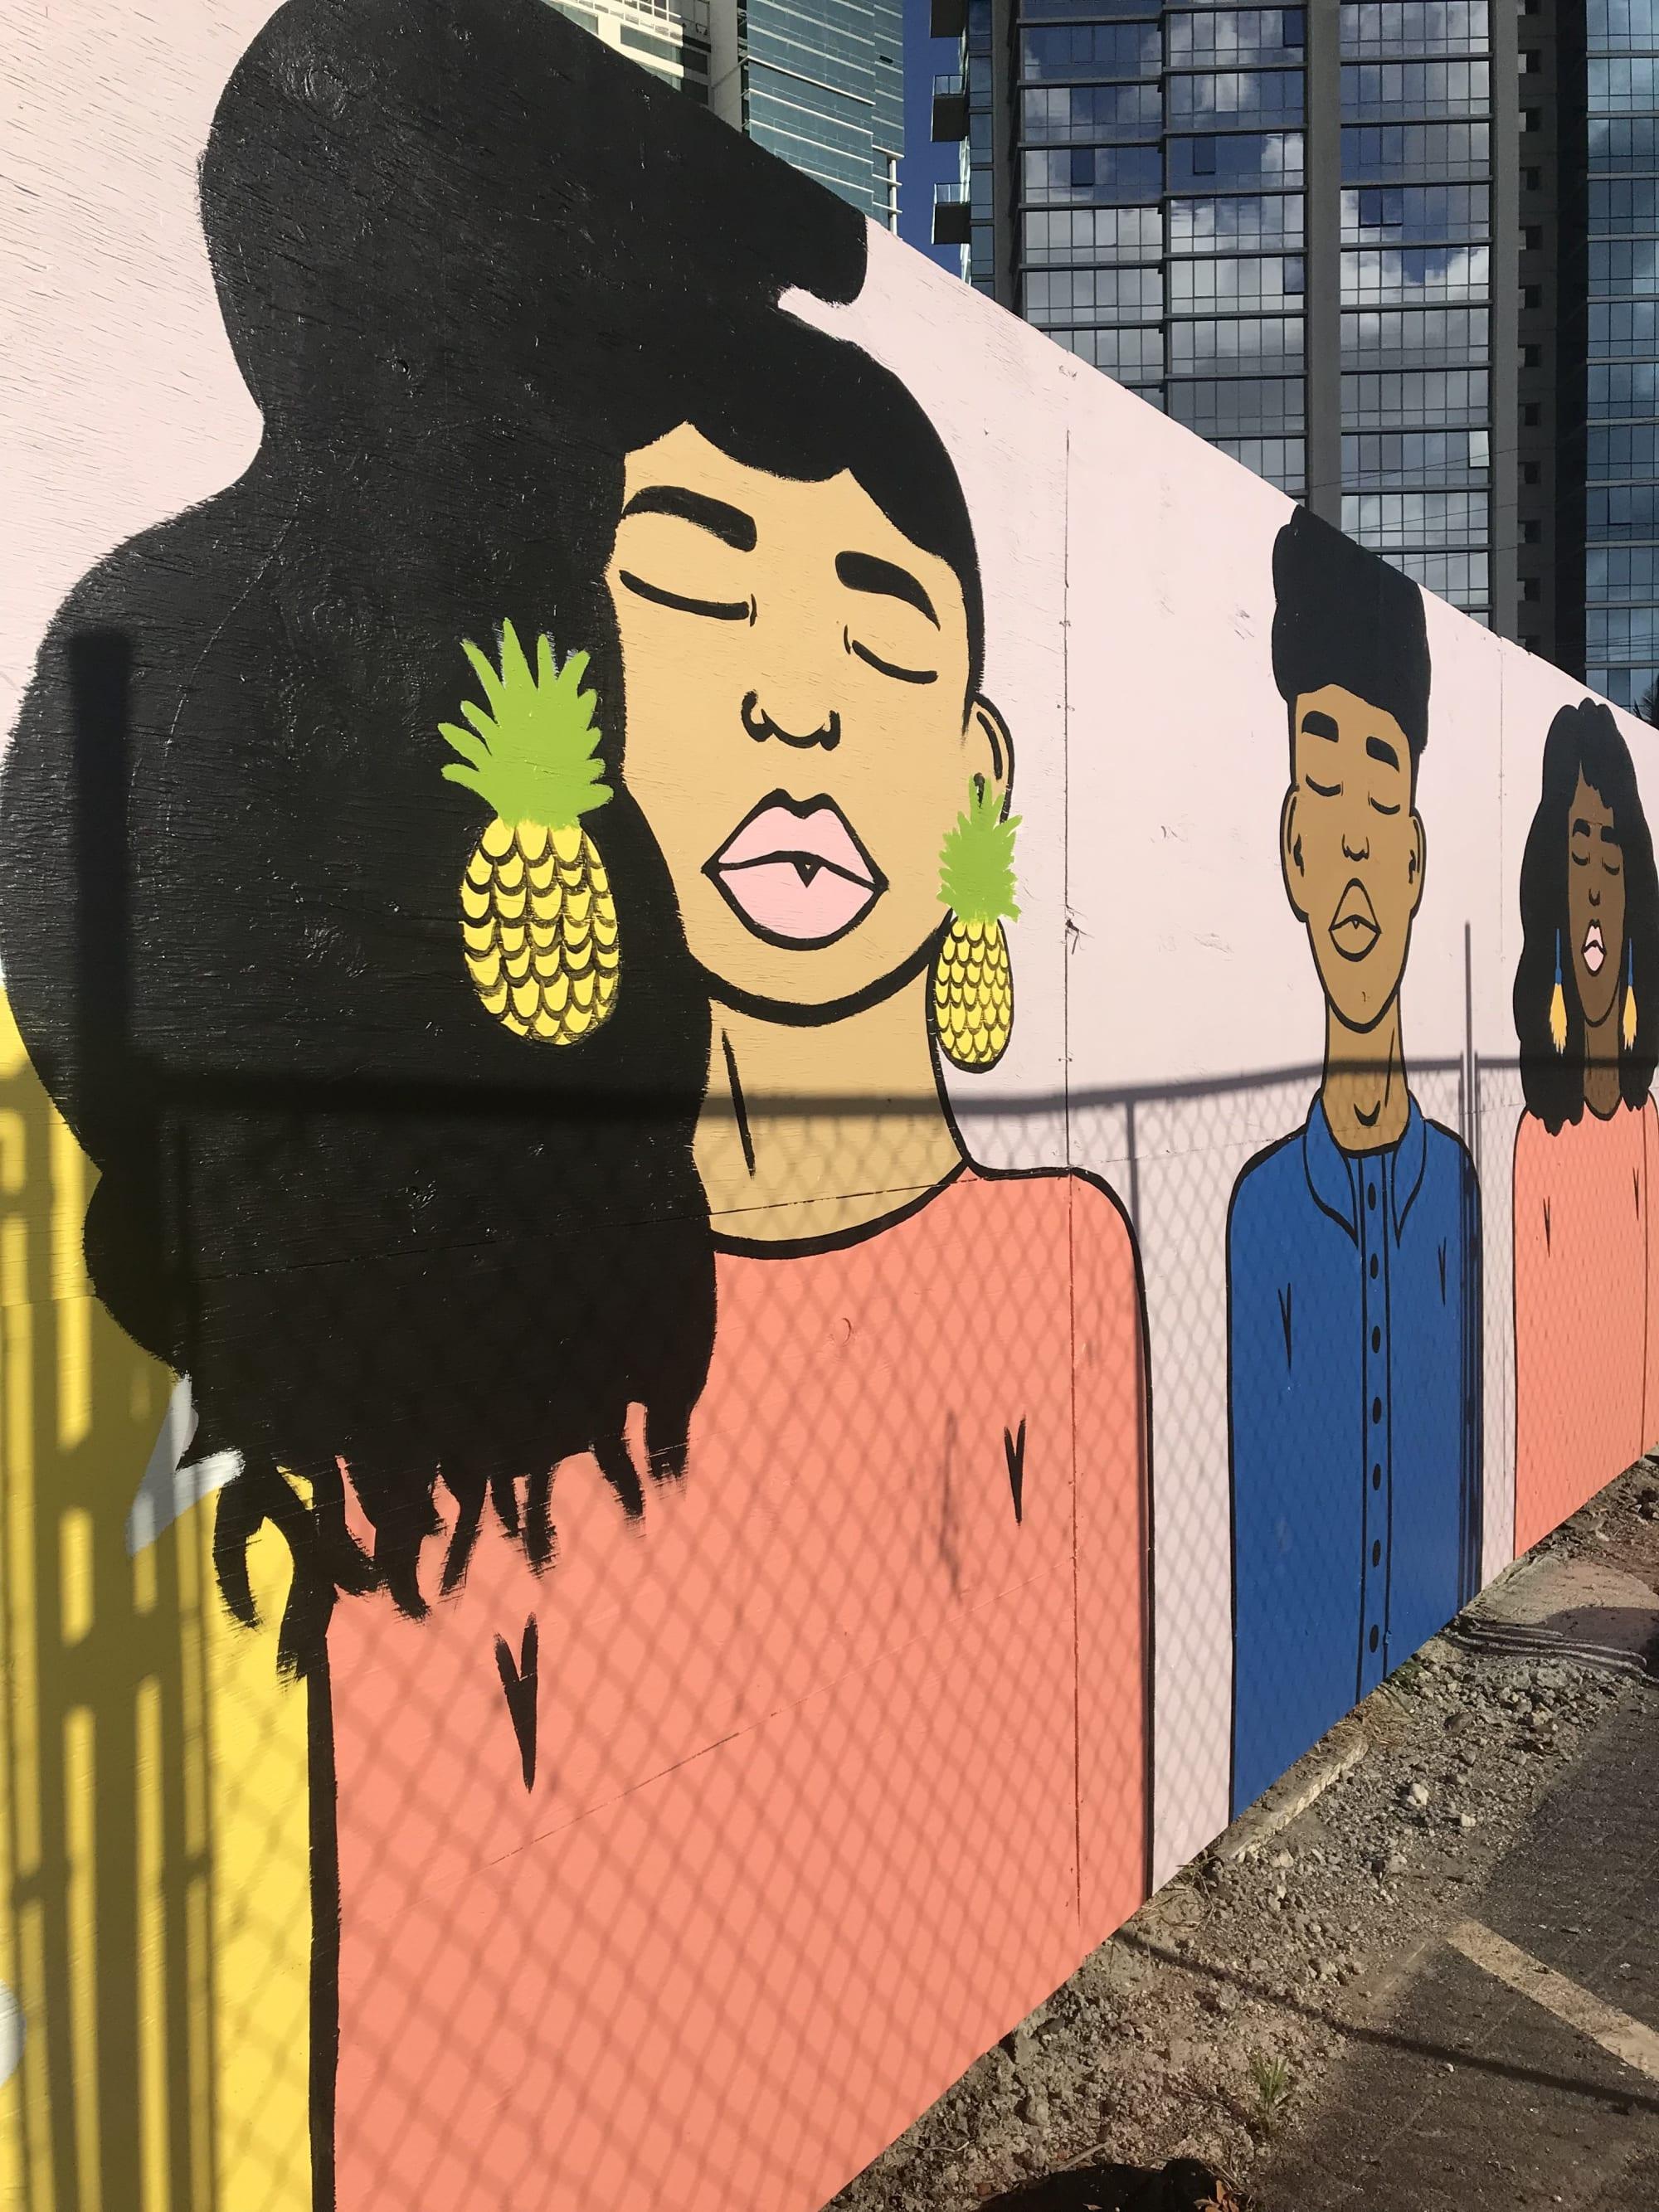 Girl with pineapple earrings mural